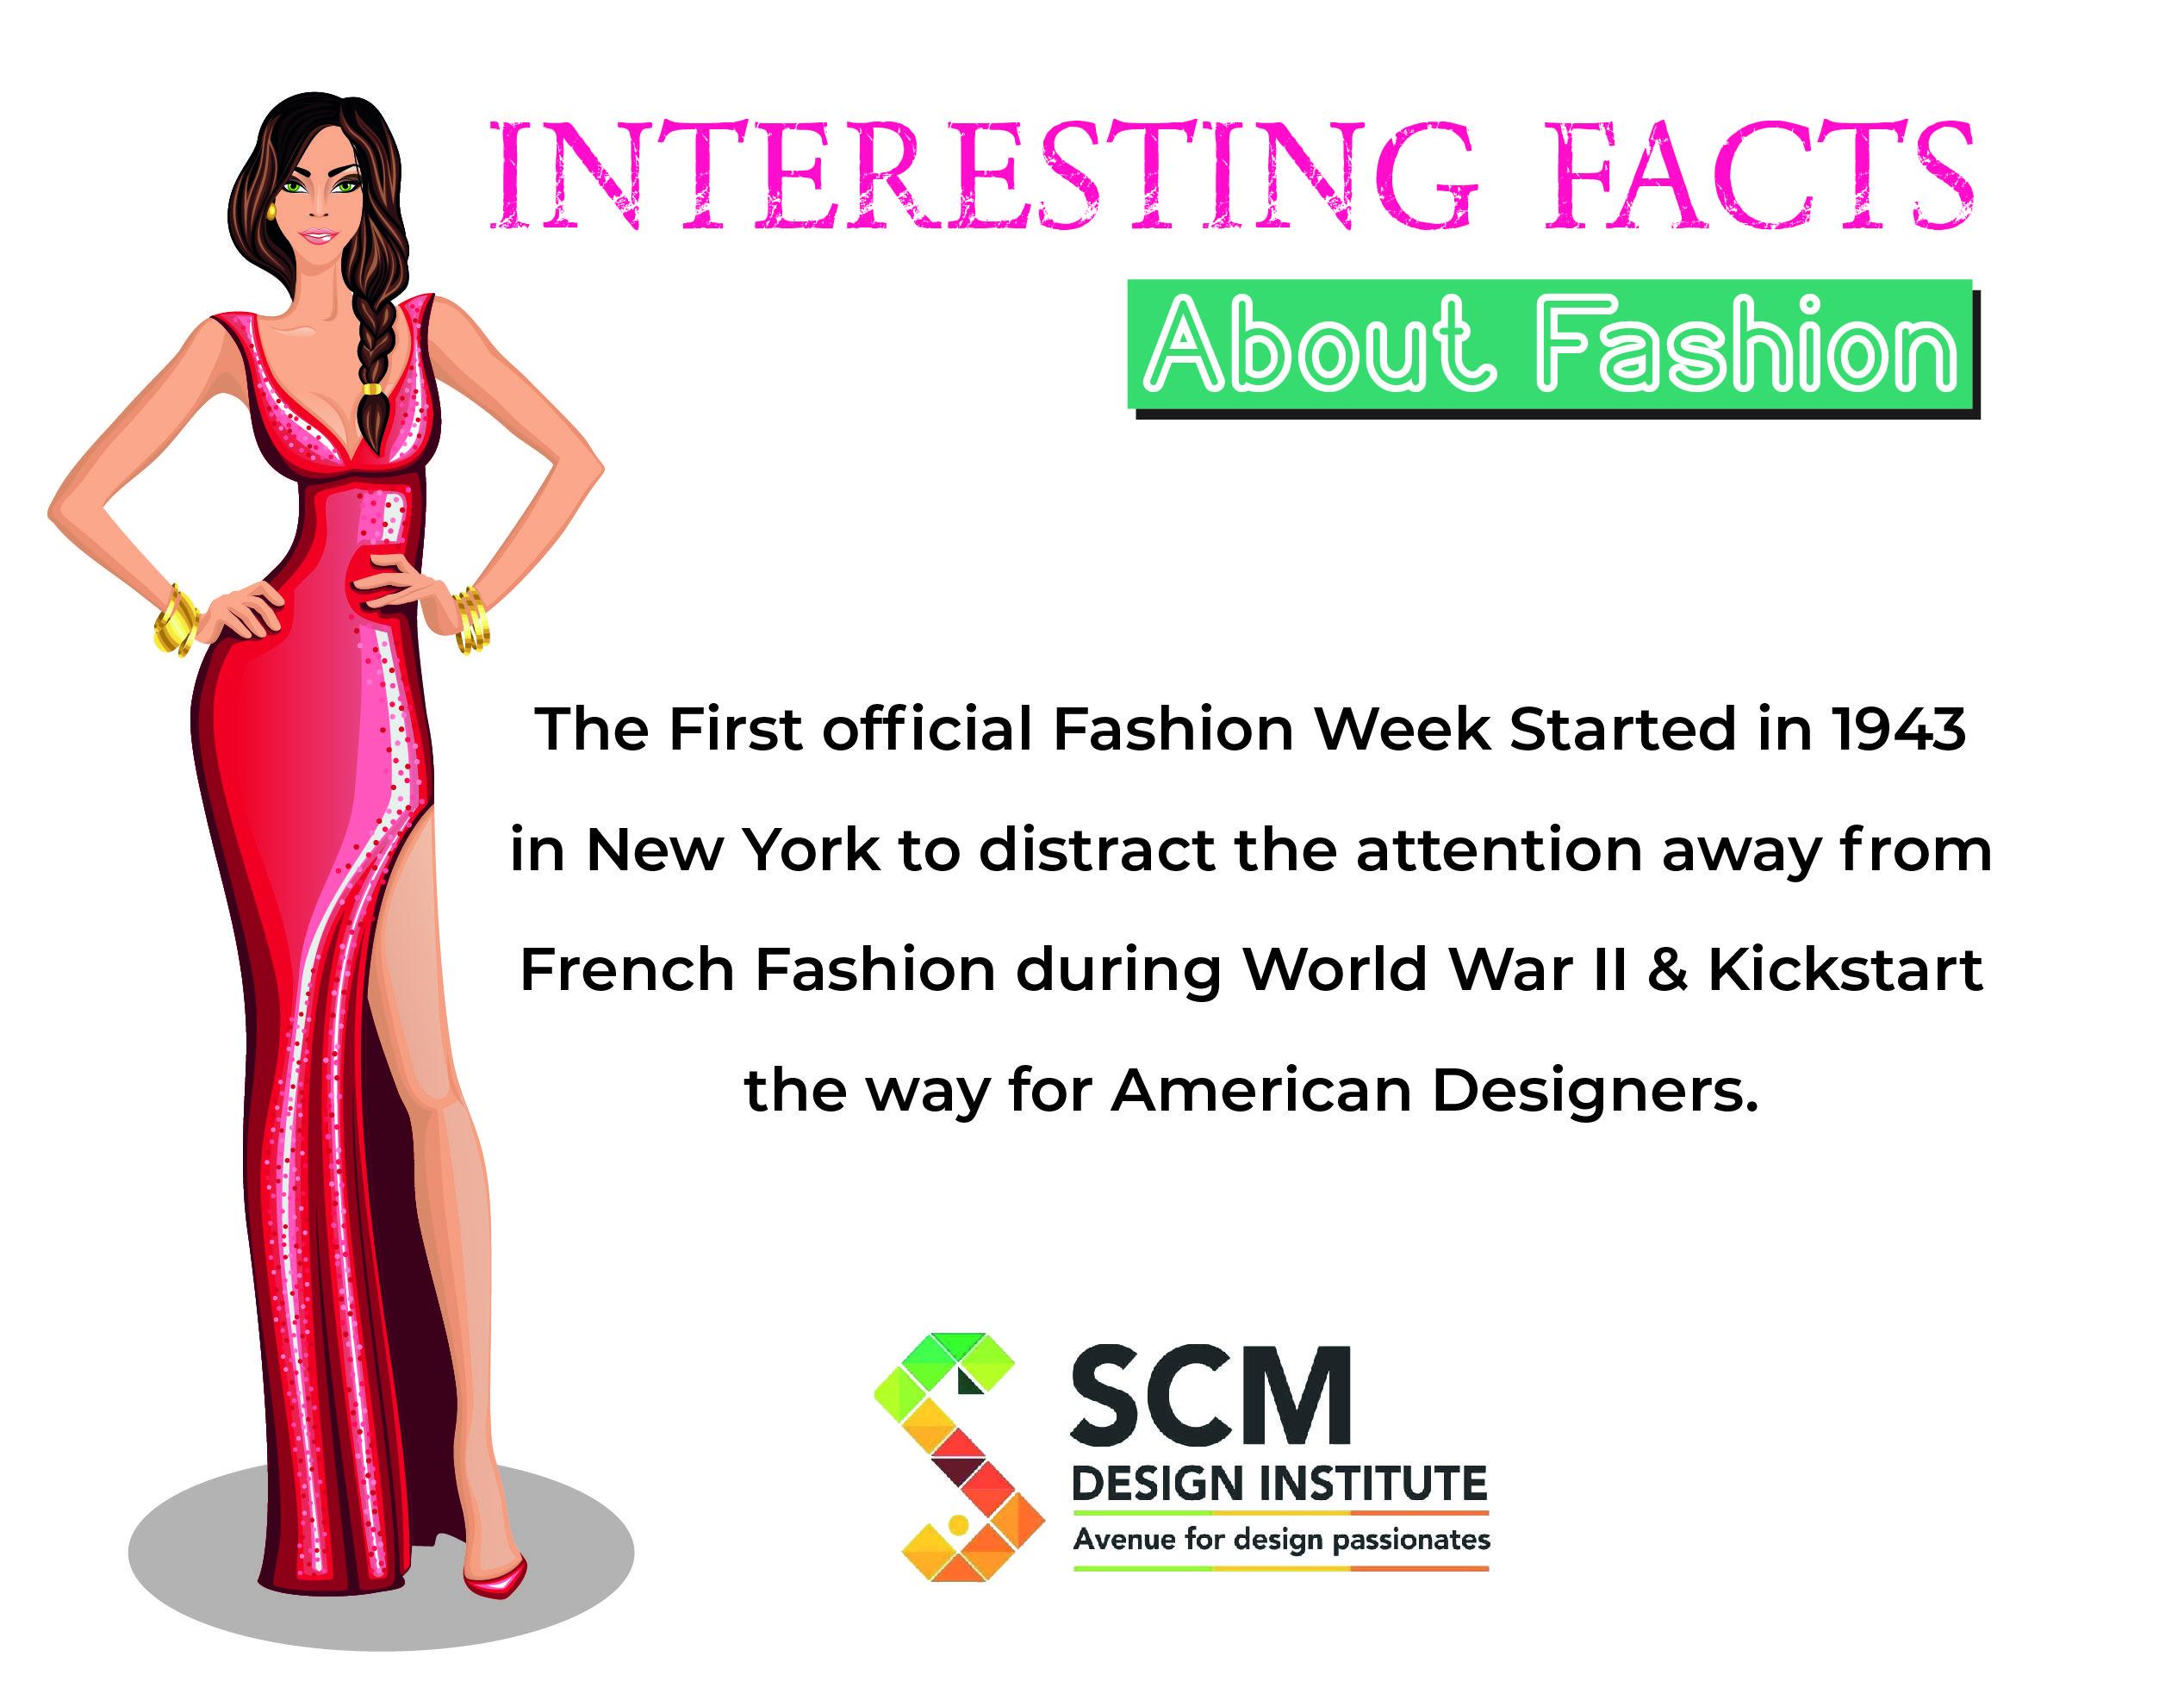 Did You Know Doyouknow Fashionweek Newyork Ny Frenchfashion French Americandesigner Ame In 2020 Fashion Design American Design French Fashion